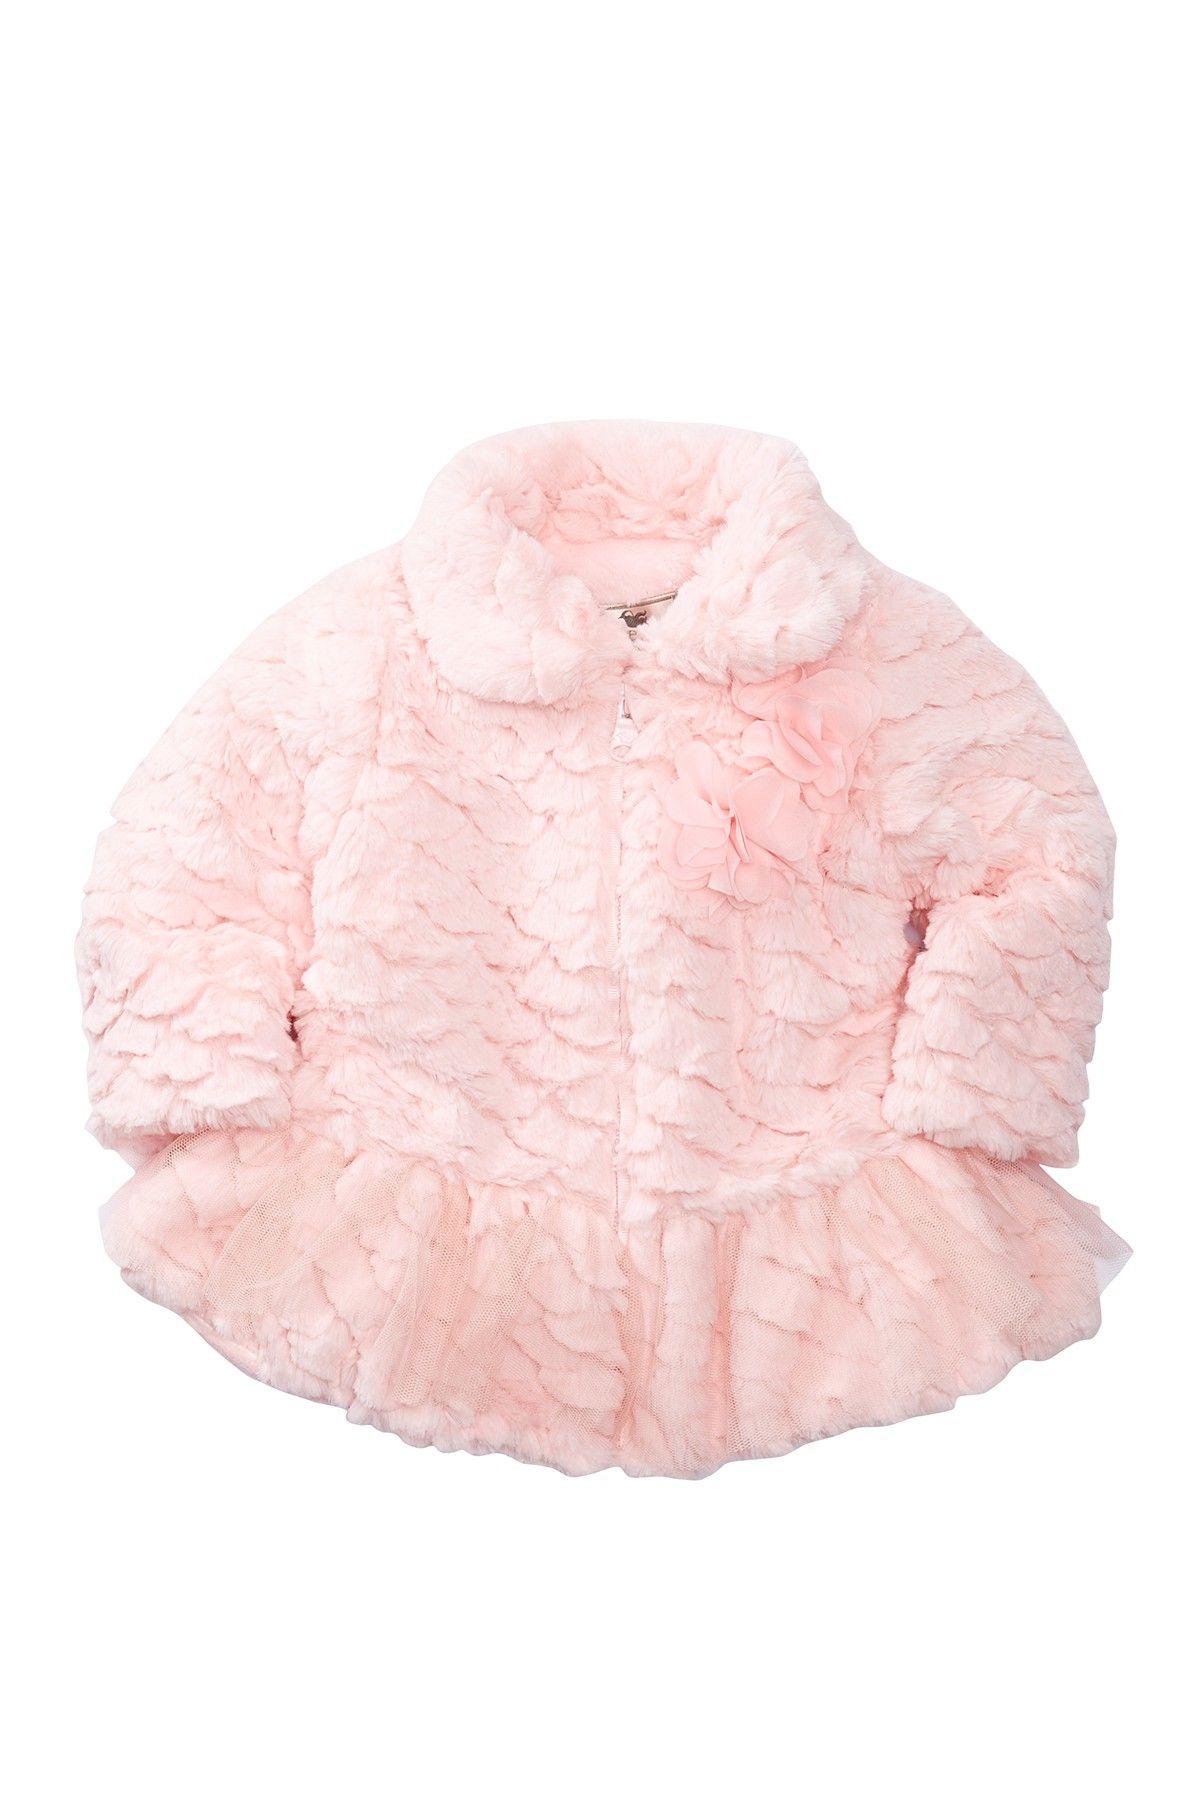 Saras Prints Tutu Faux Fur Coat Baby Girls Nordstrom Rack Fur Coat Kids Coats Faux Fur Coat